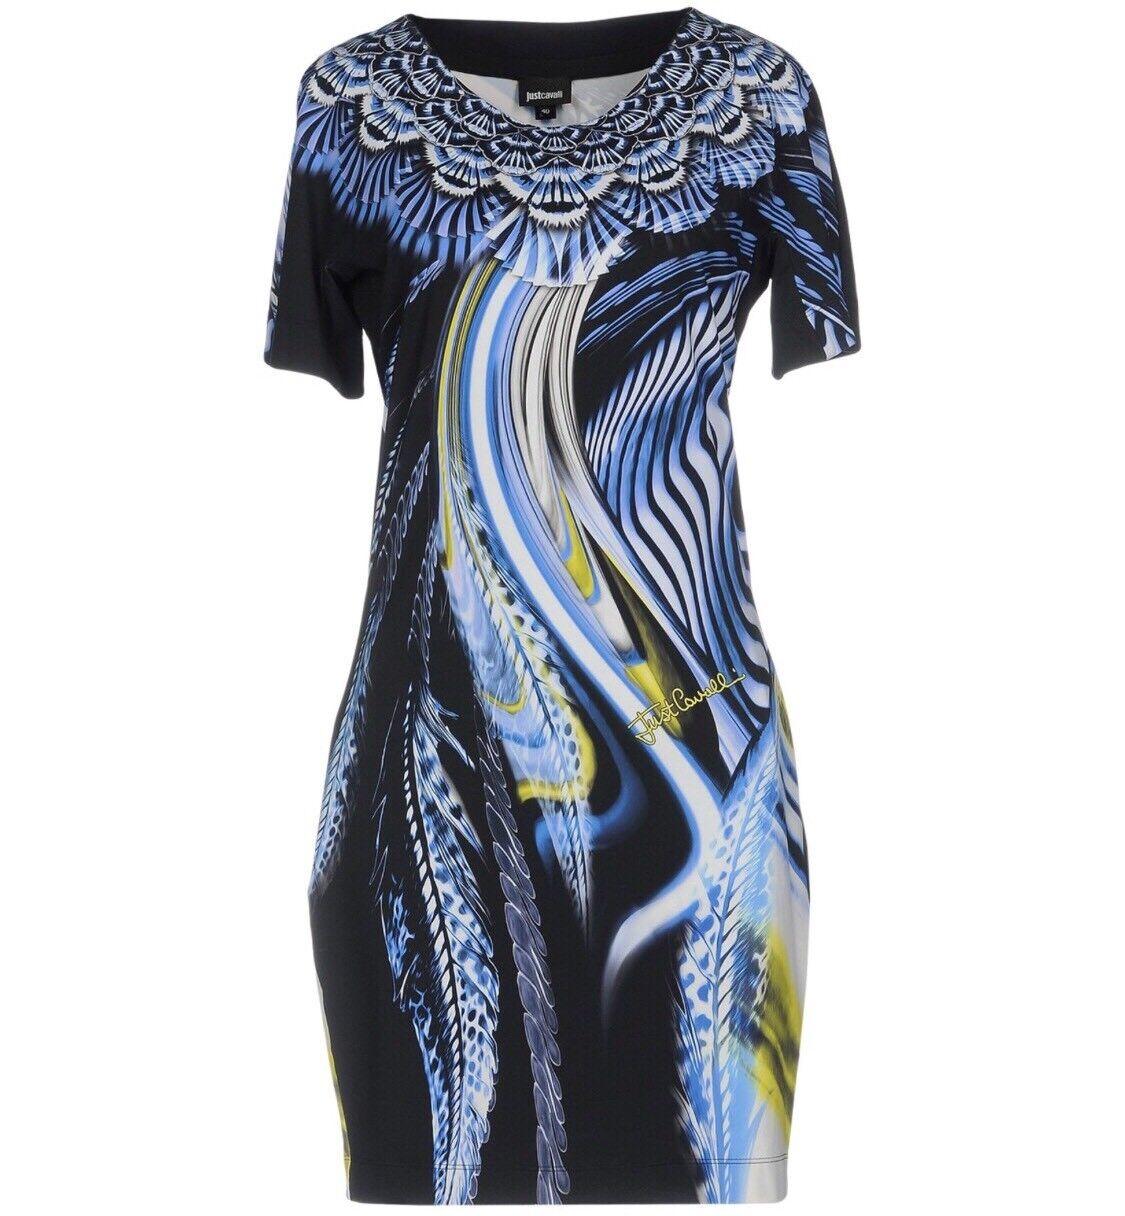 Genuine Just Cavalli Floral Print Jersey Dress Size 6UK XS RRP